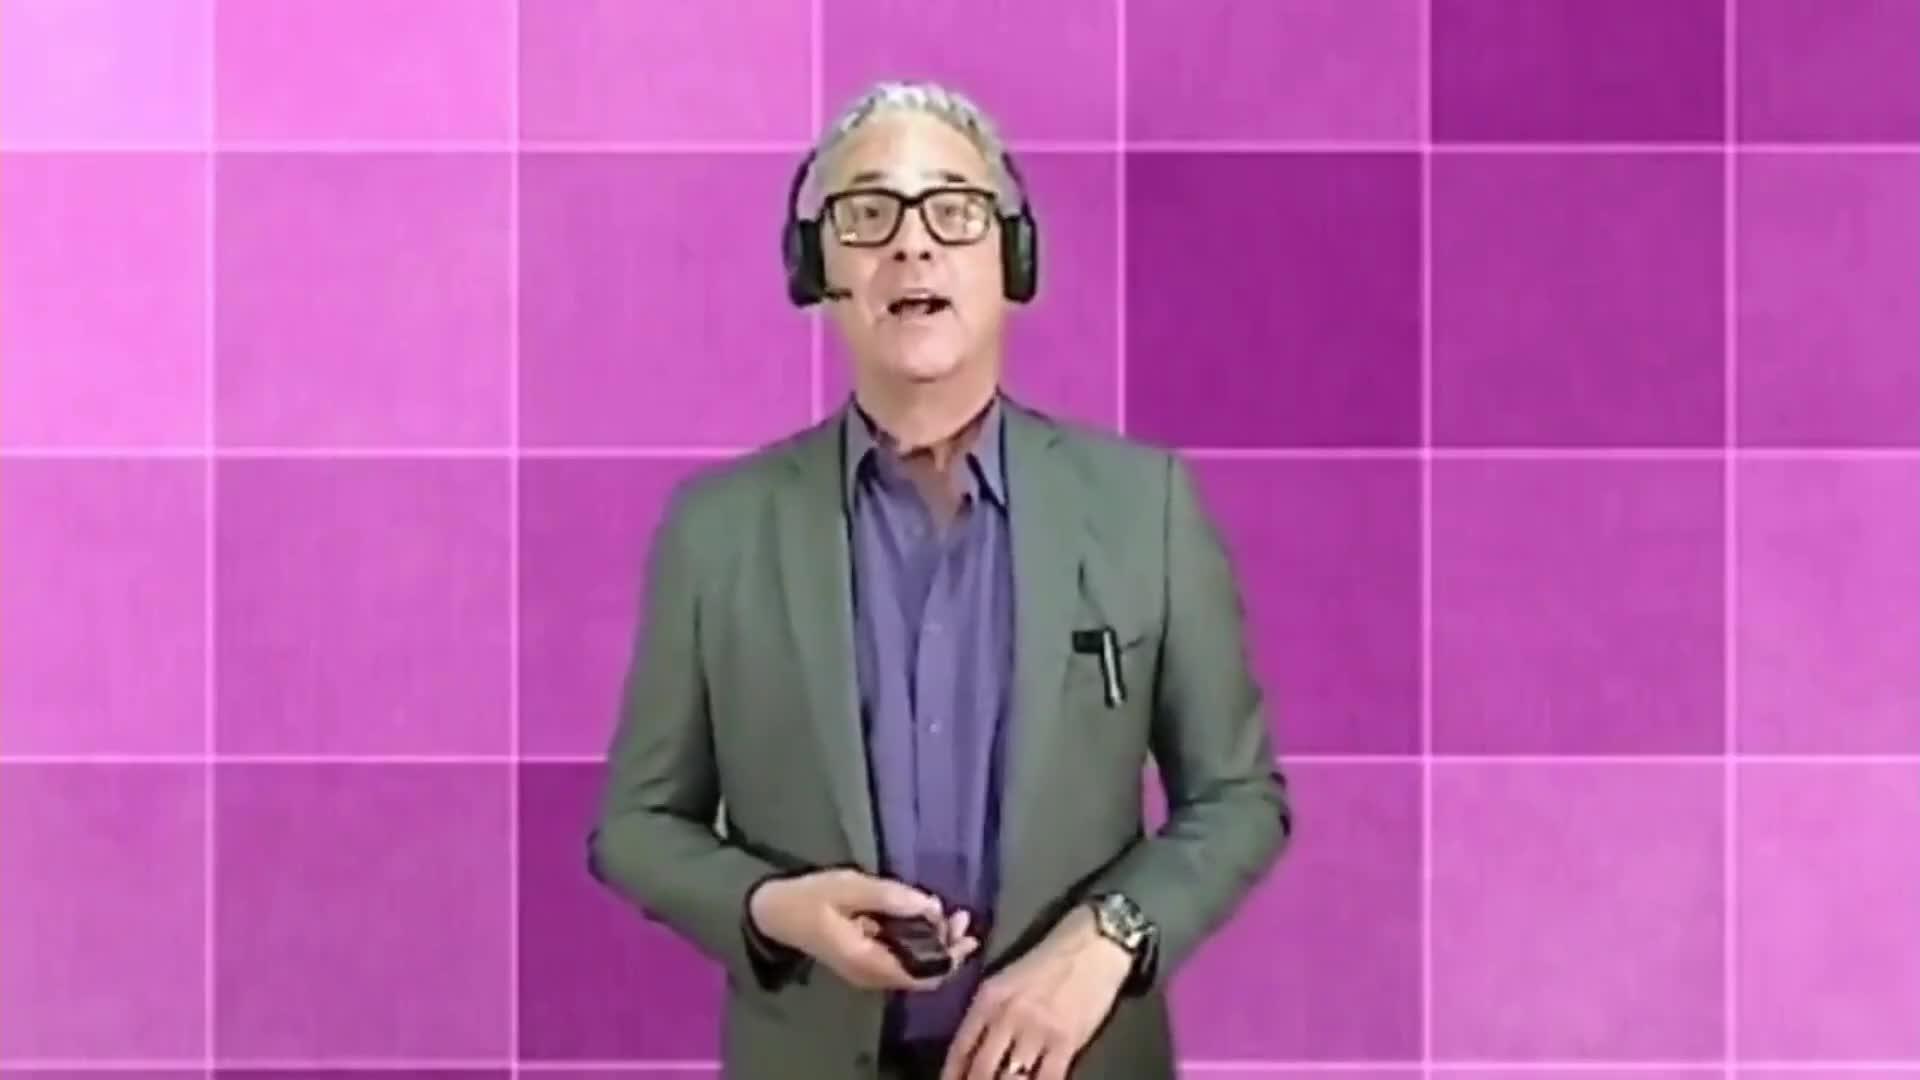 Ovations - Darren Isenberg Virtual MC Sample